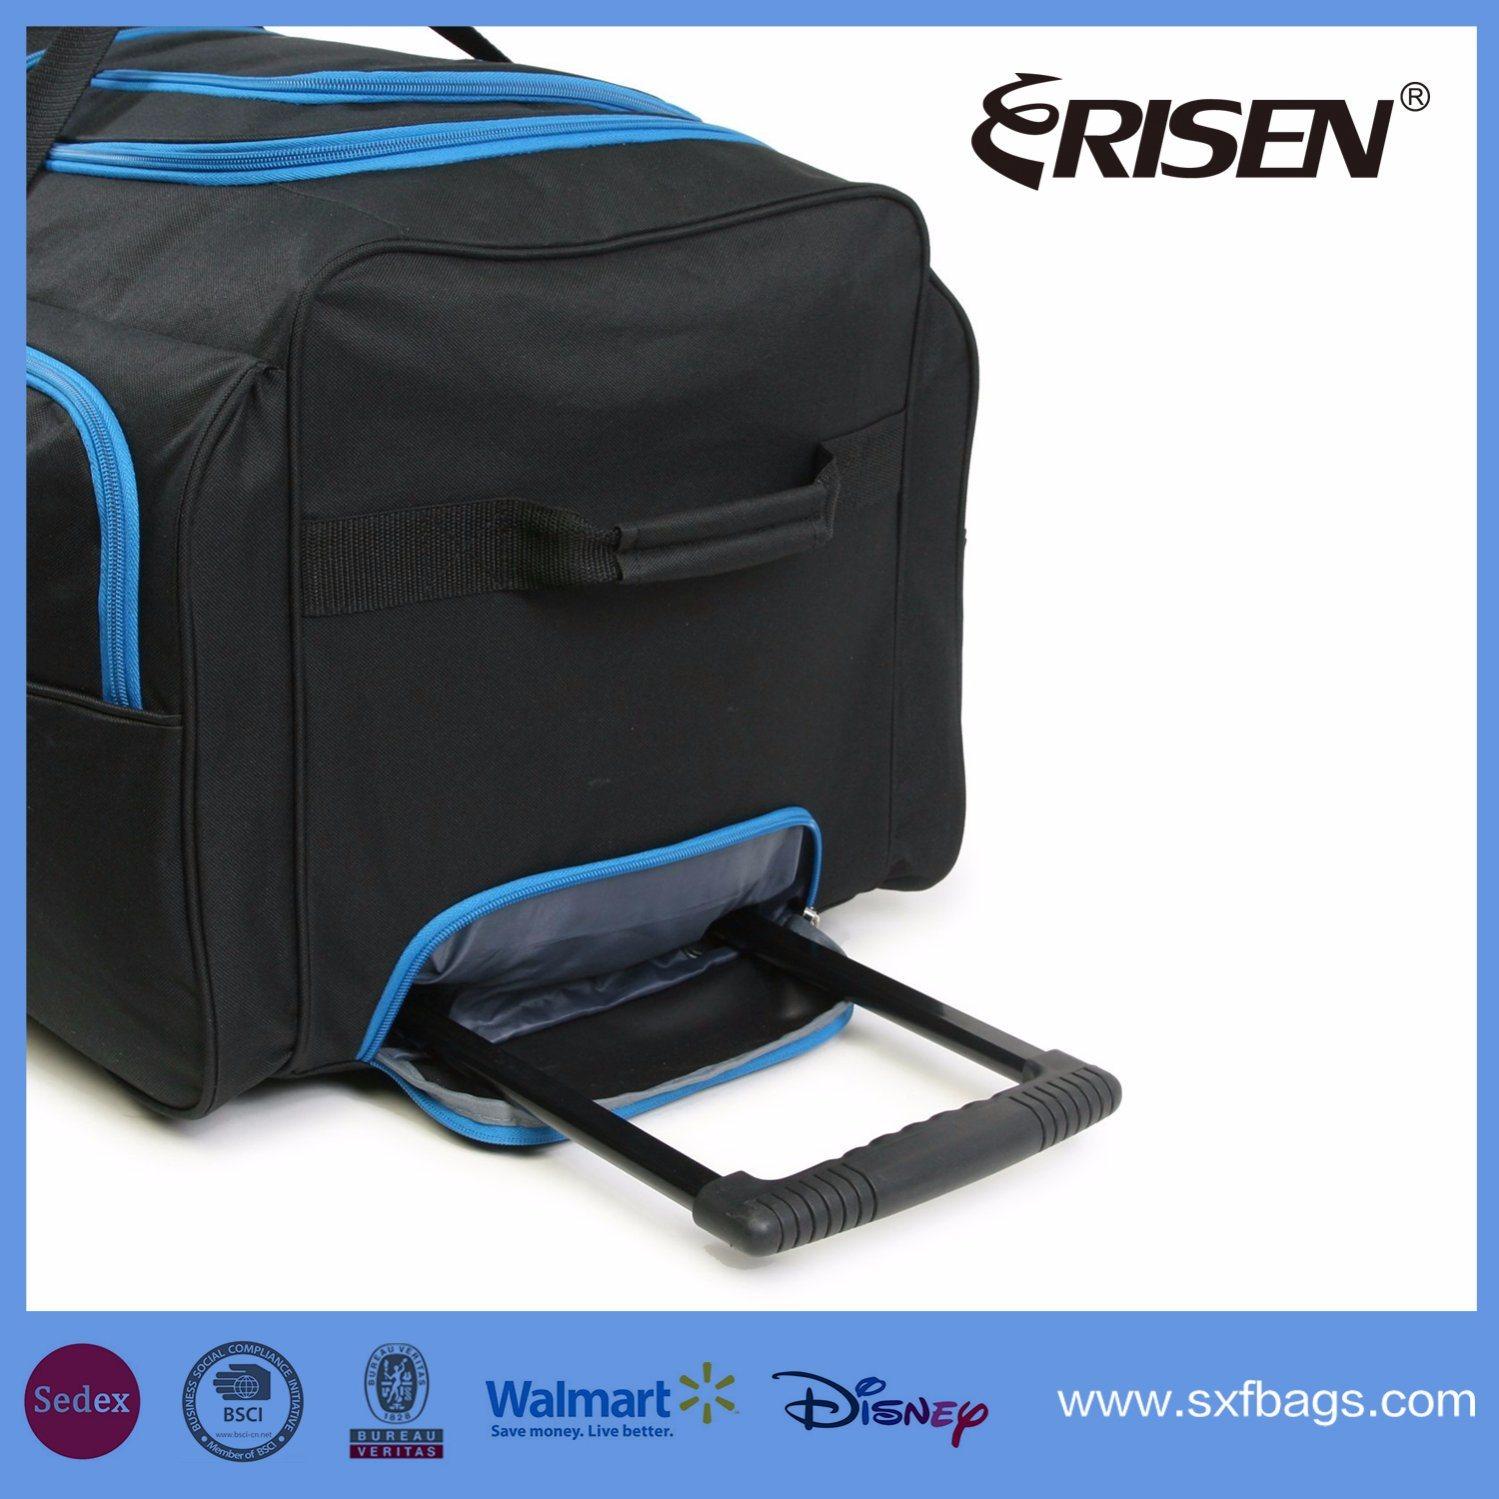 Waterproof Wheeled Trolley Fashion Leisure Travel Luggage Duffel Bag